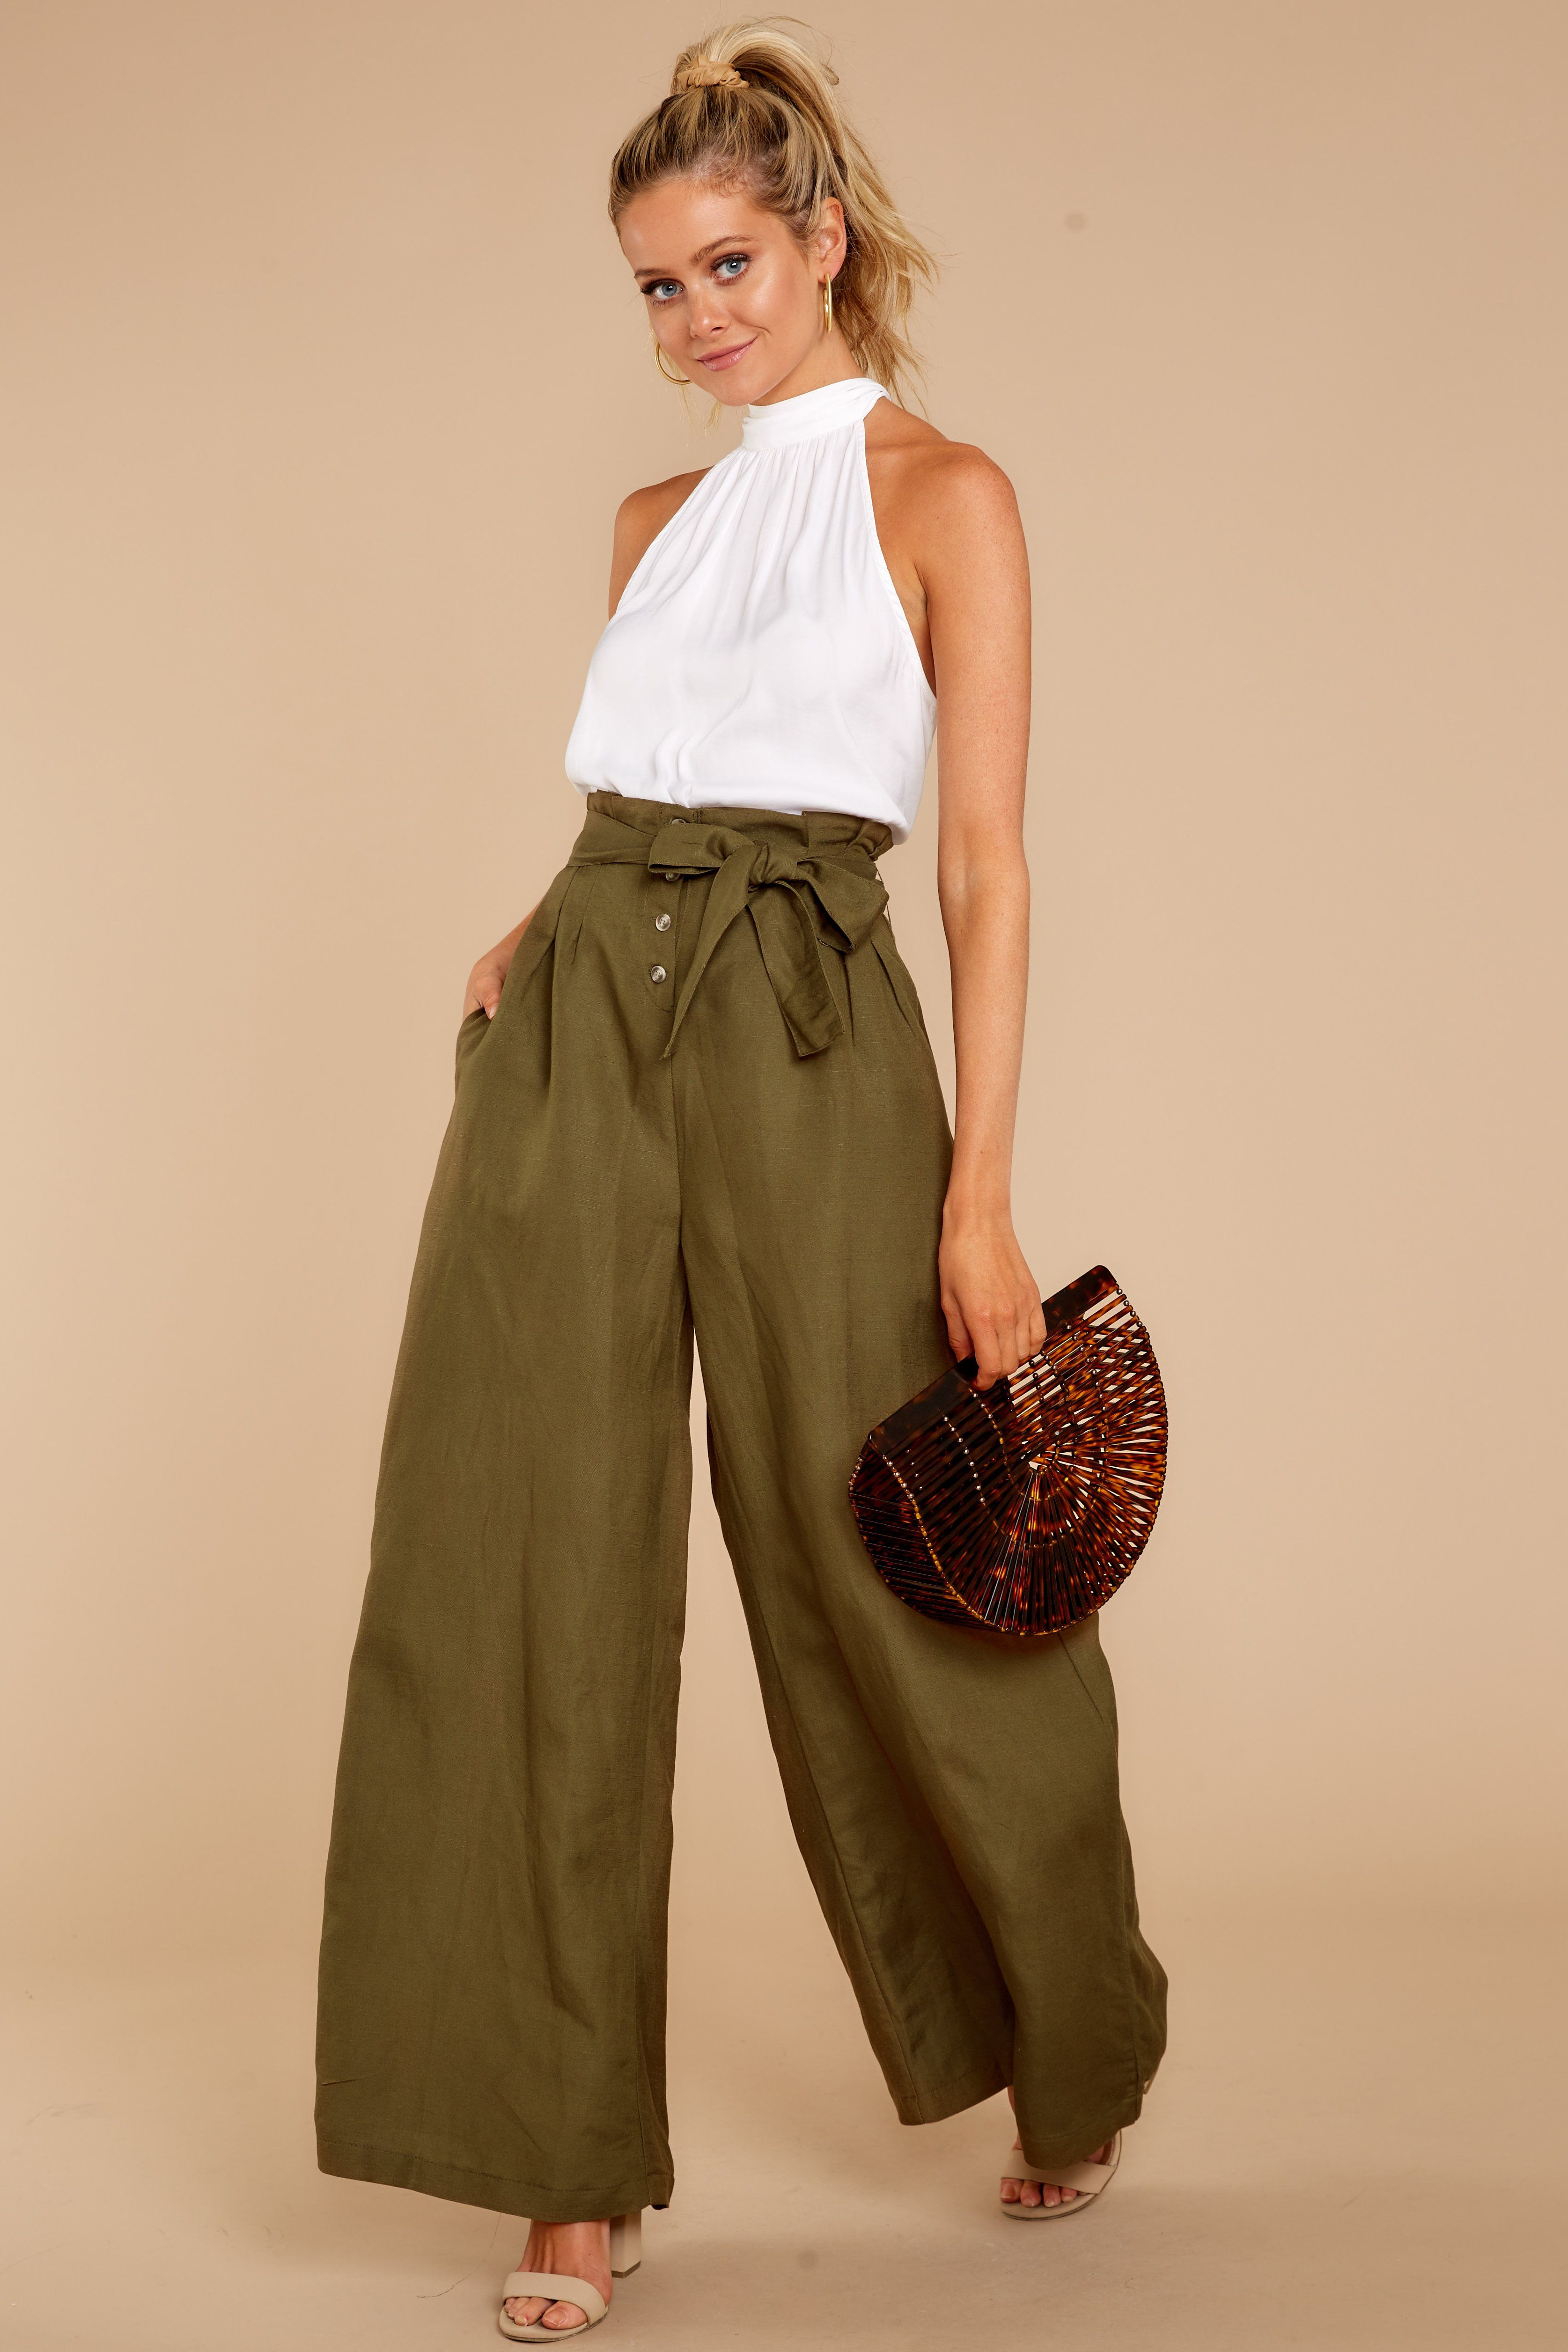 Stylish Olive Green Pants Chic Wide Leg Pants Pants 48 00 Red Dress Boutique Wide Leg Pants Outfit Summer Summer Pants Outfits Wide Leg Pants Outfit [ 5024 x 3349 Pixel ]